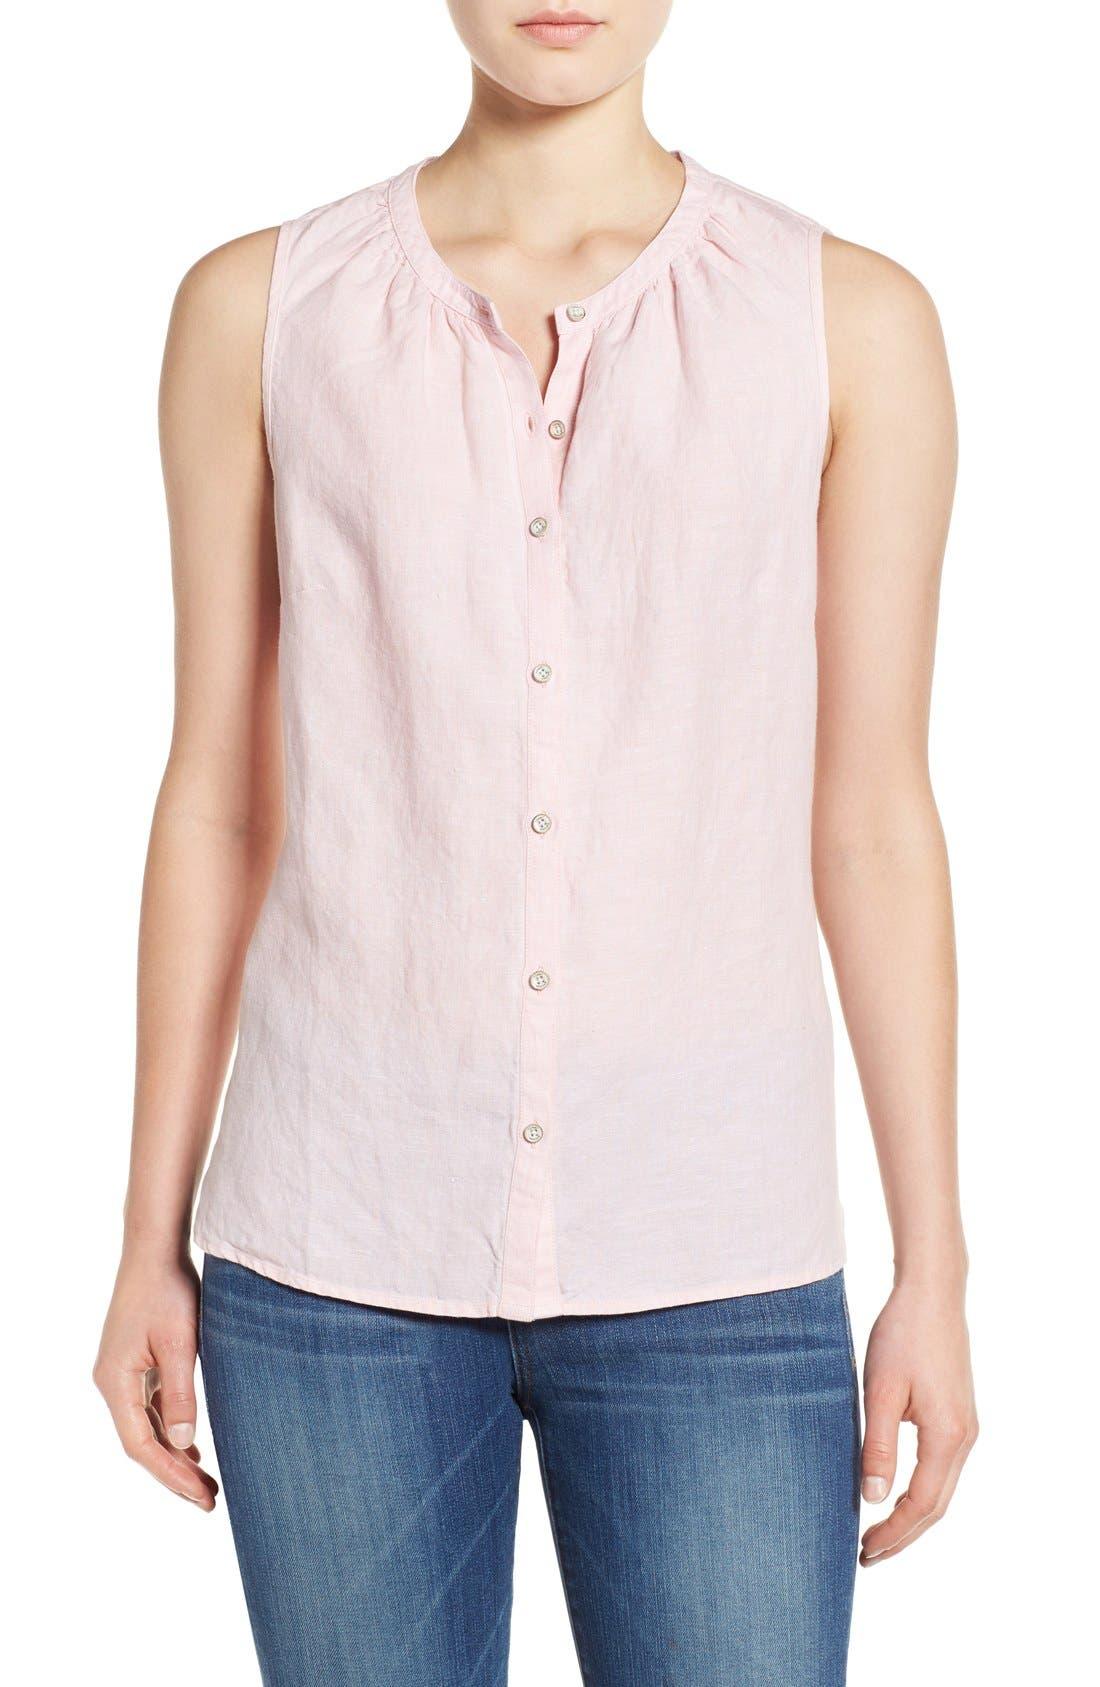 Main Image - Tommy Bahama 'Sunset Chambray' Sleeveless Shirt